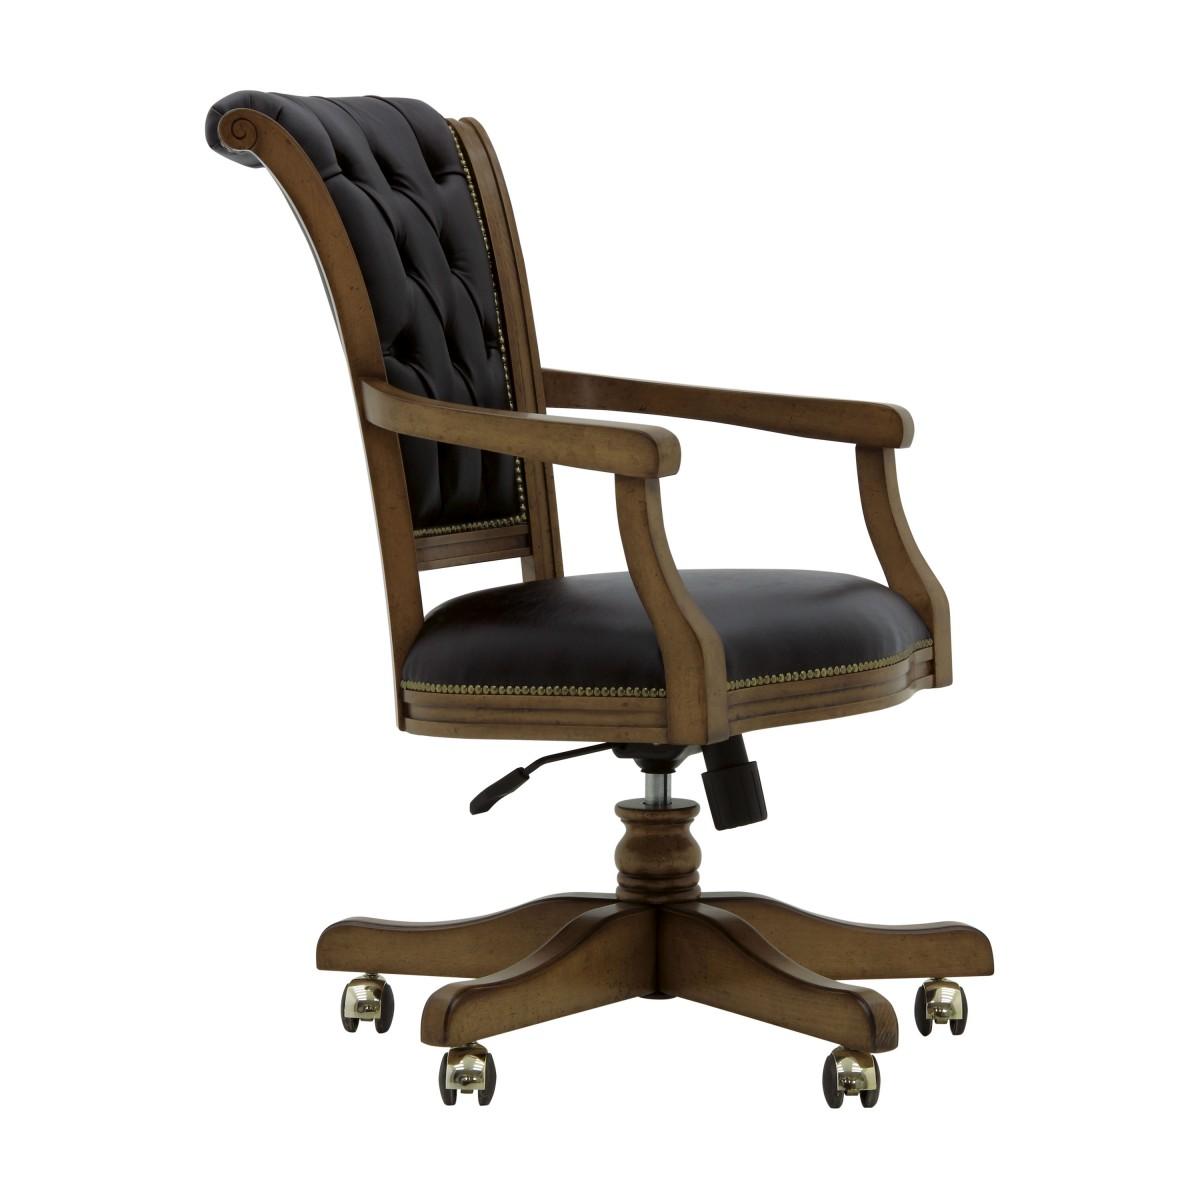 Small armchair Paris - Sevensedie